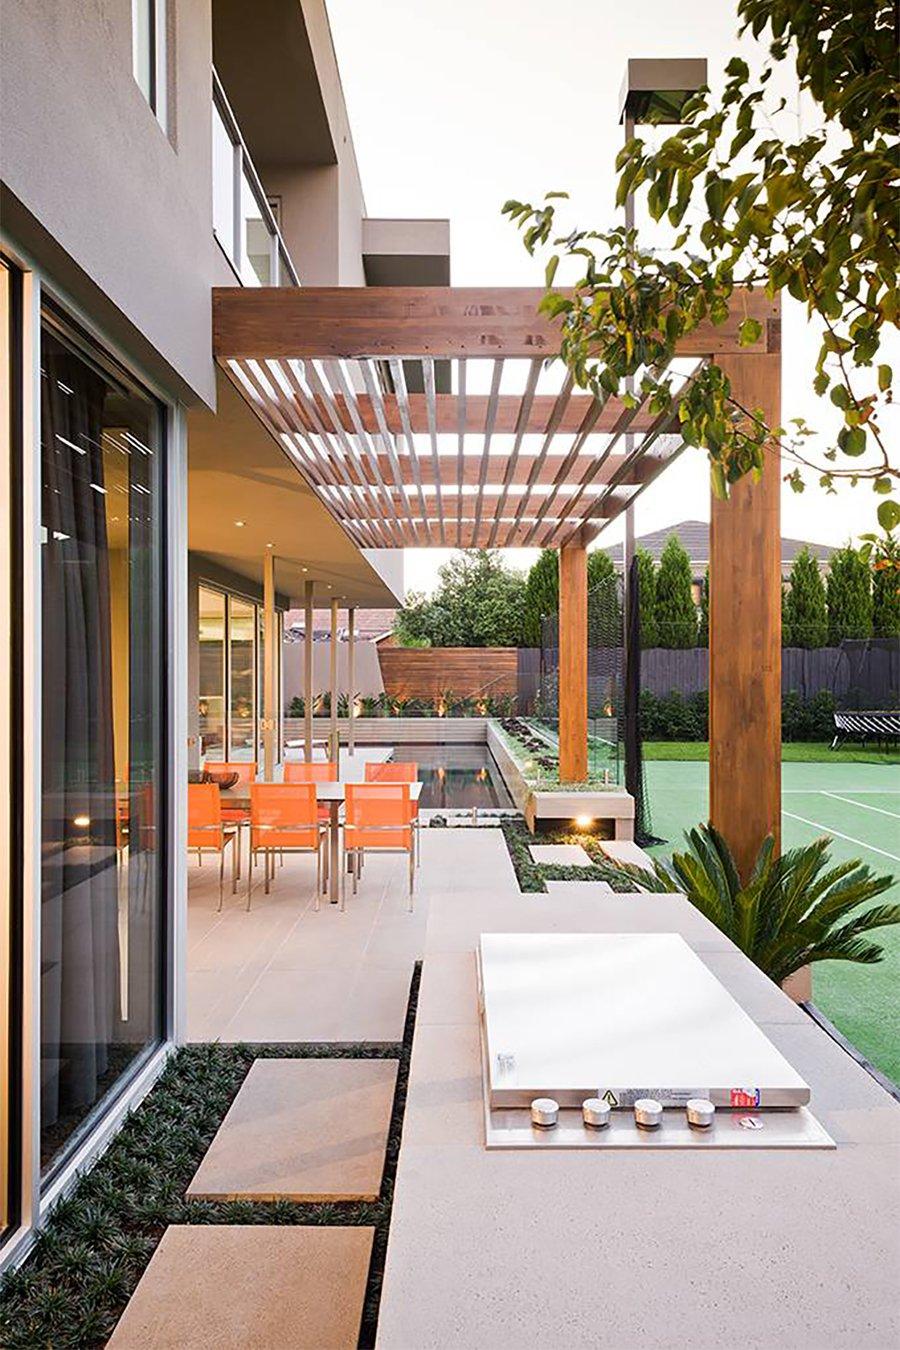 outdoor living dreamy pergola ideas for our deck on Pergola Modern Design id=98763